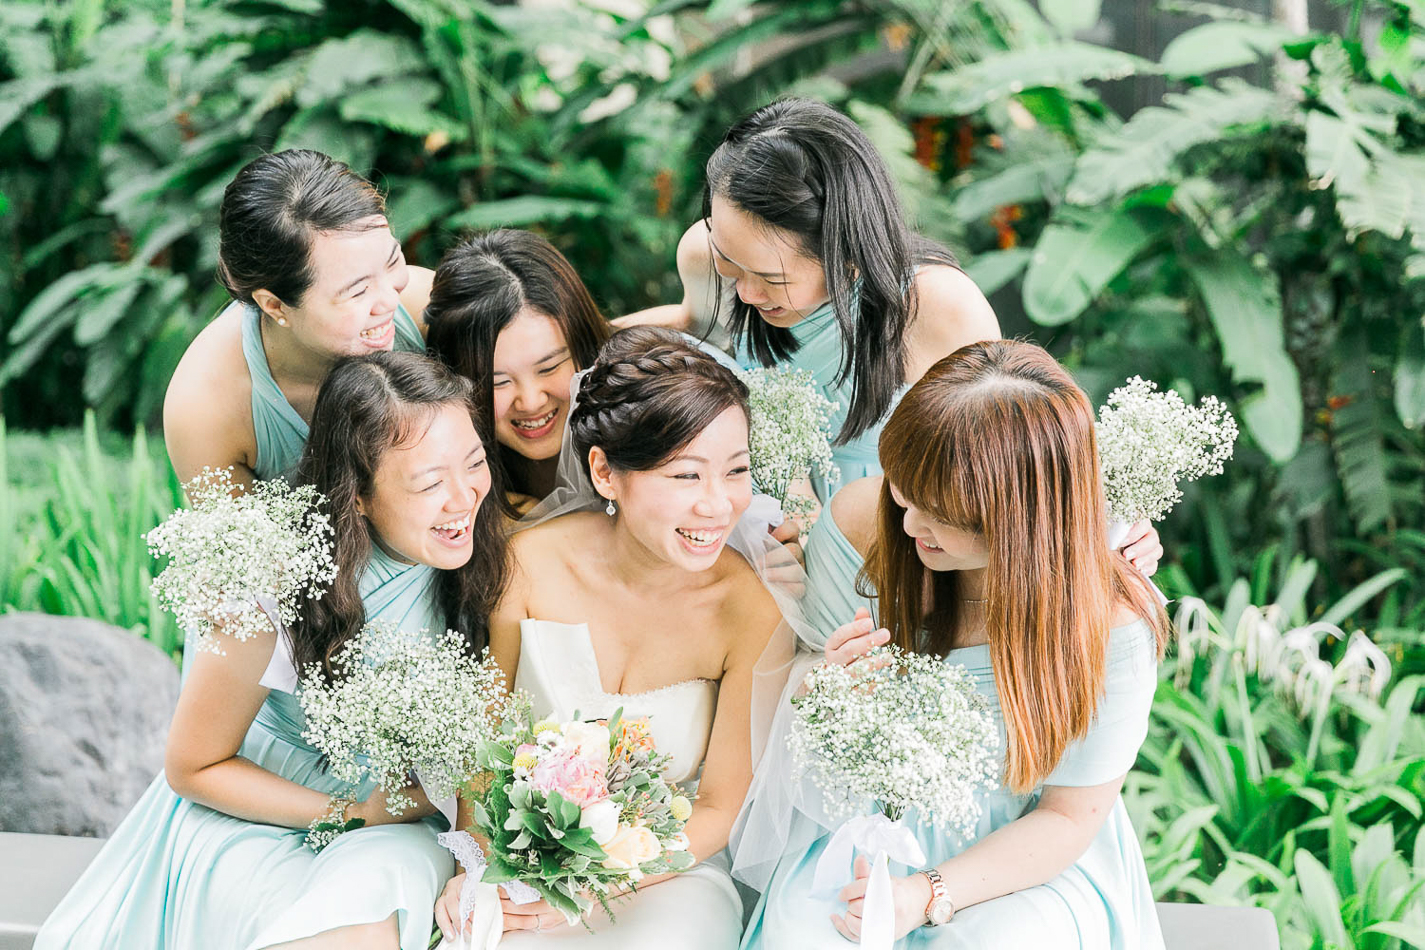 wedding-photographer-singapore-film-photographer-chen-sands-MinKang-wedding-CSPBLOG-22.jpg